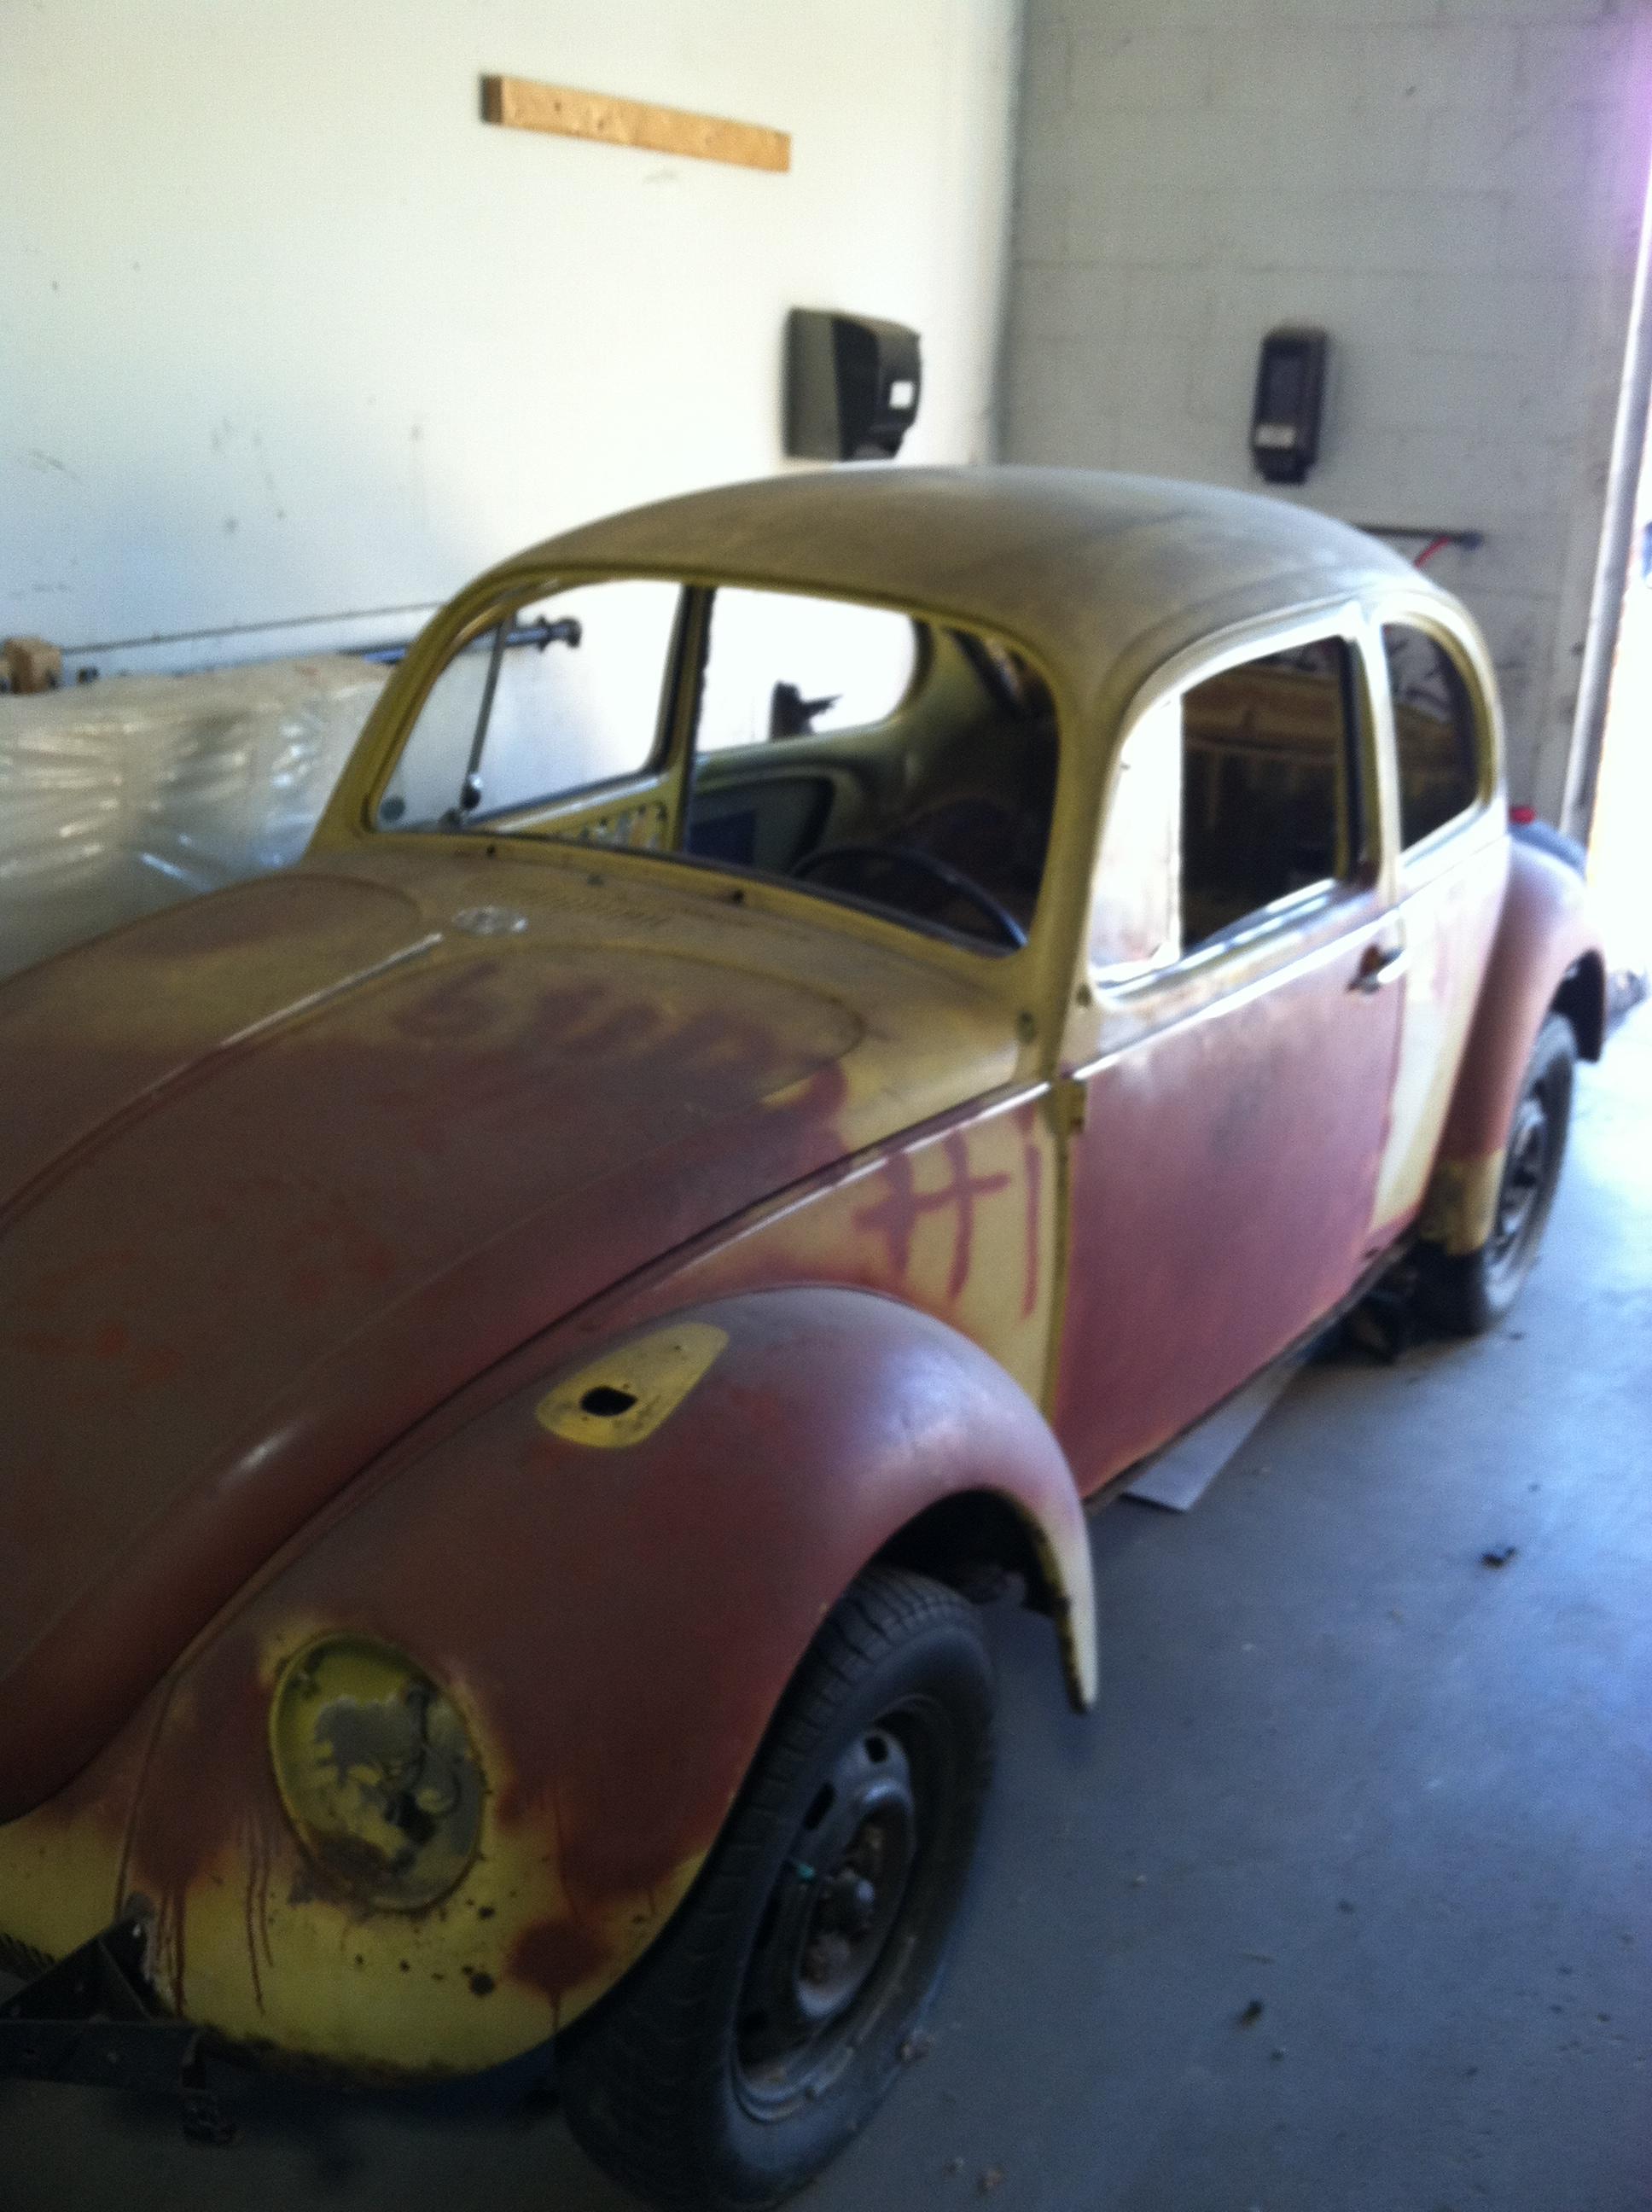 pin craigslist beetle super vw convertible ride s volkswagen sweet shelia